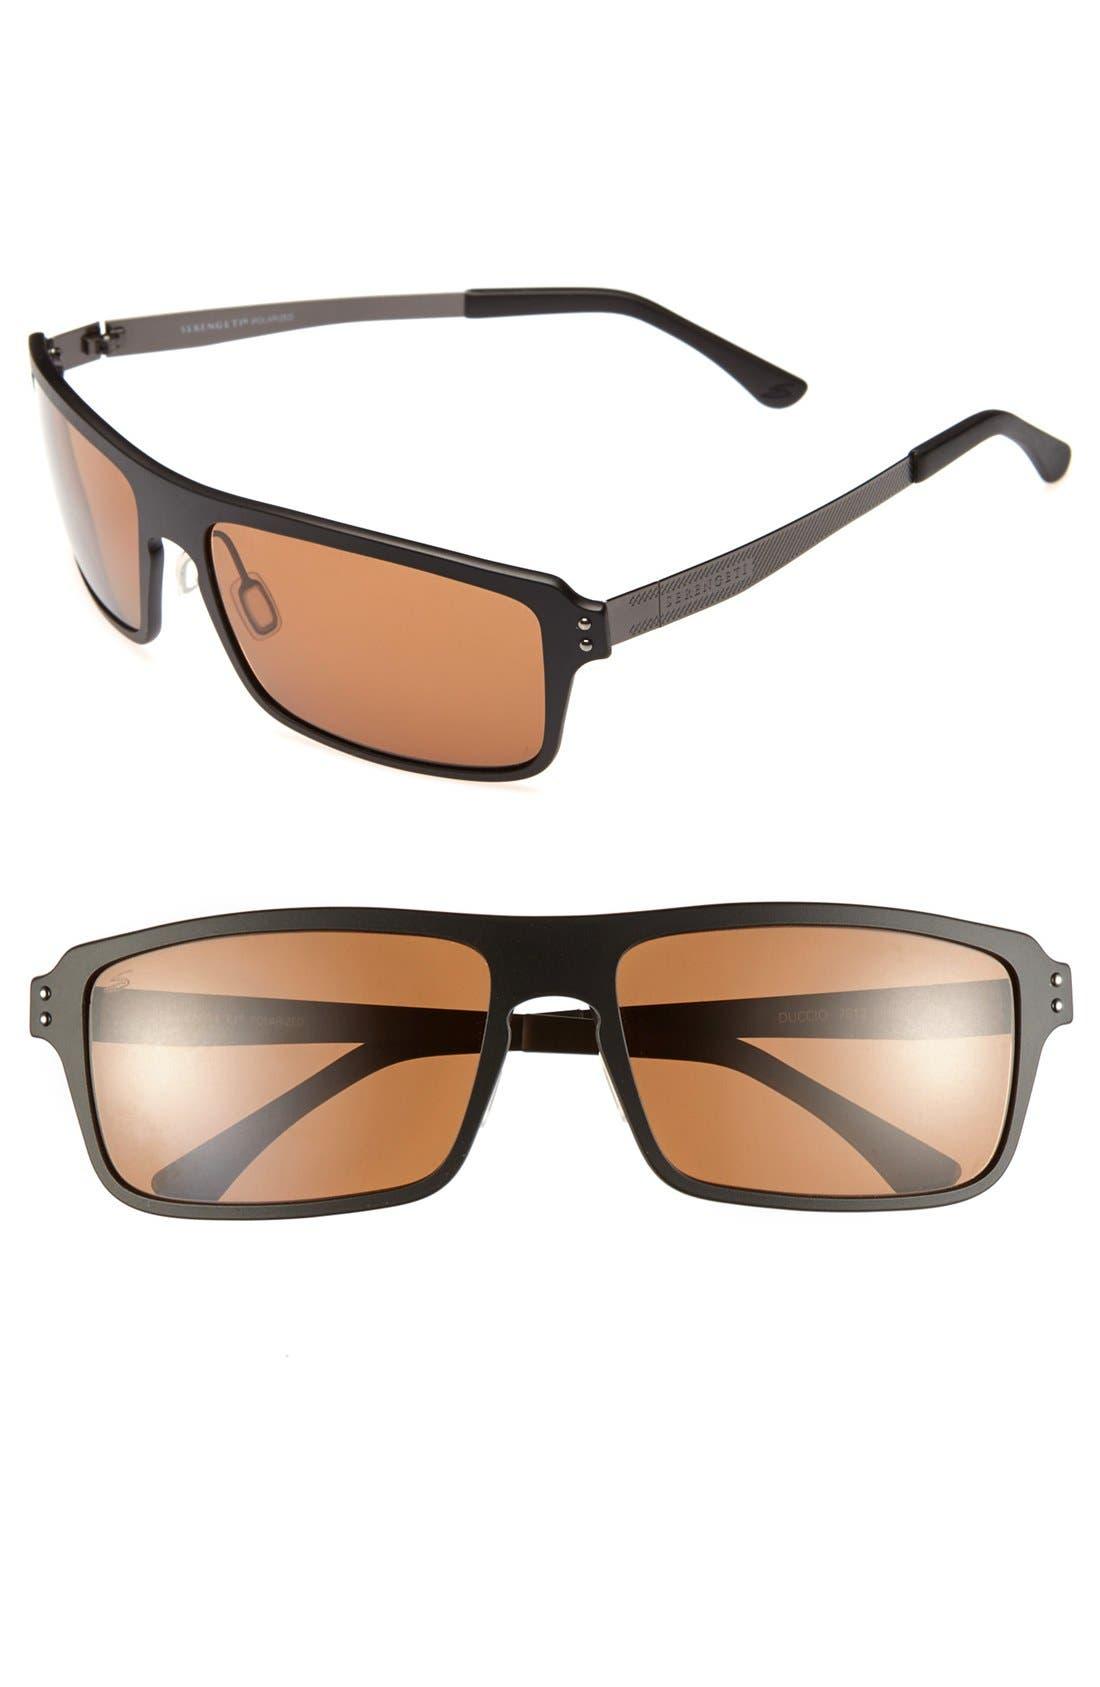 Alternate Image 1 Selected - Serengeti 'Duccio' 65mm Polarized Sunglasses